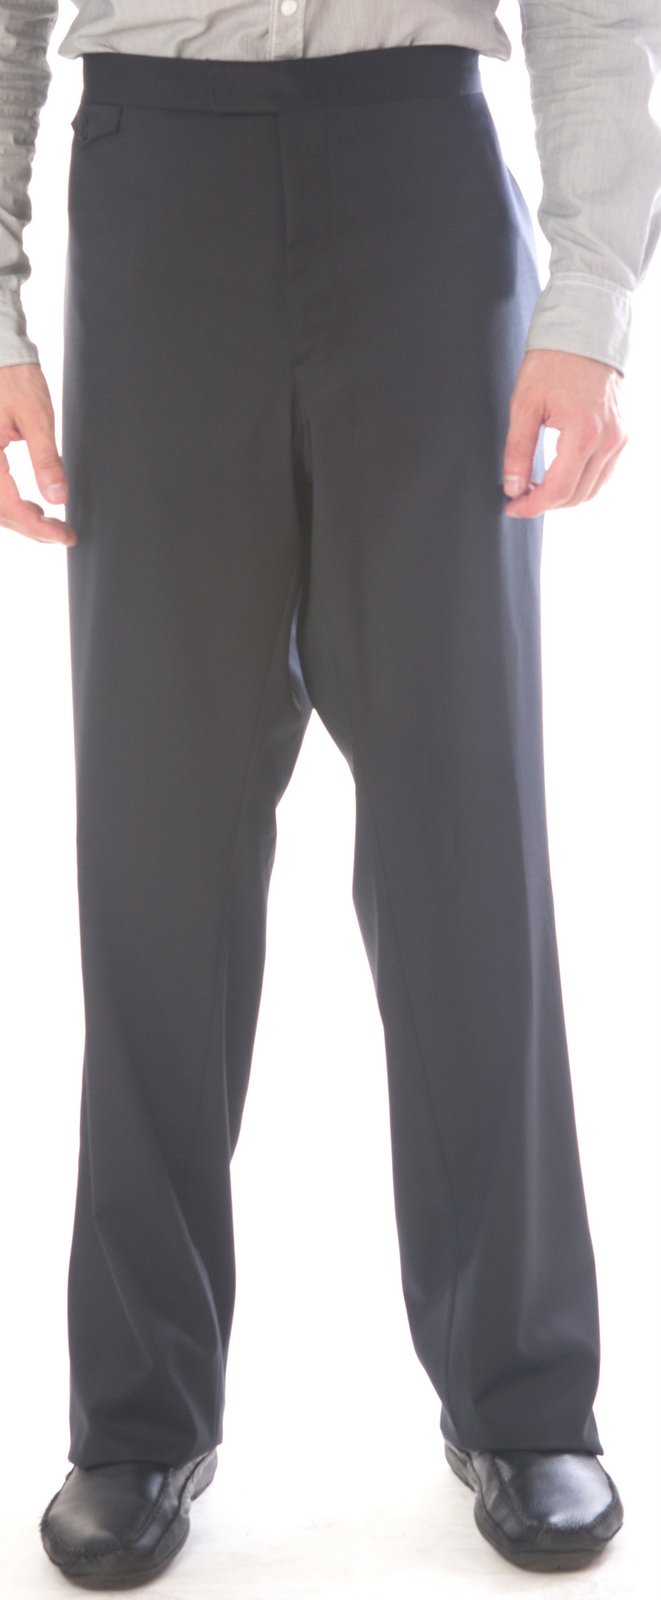 John Varvatos Mens Dress Pants Midnight Sz 58 JVD307-YHD at Sears.com